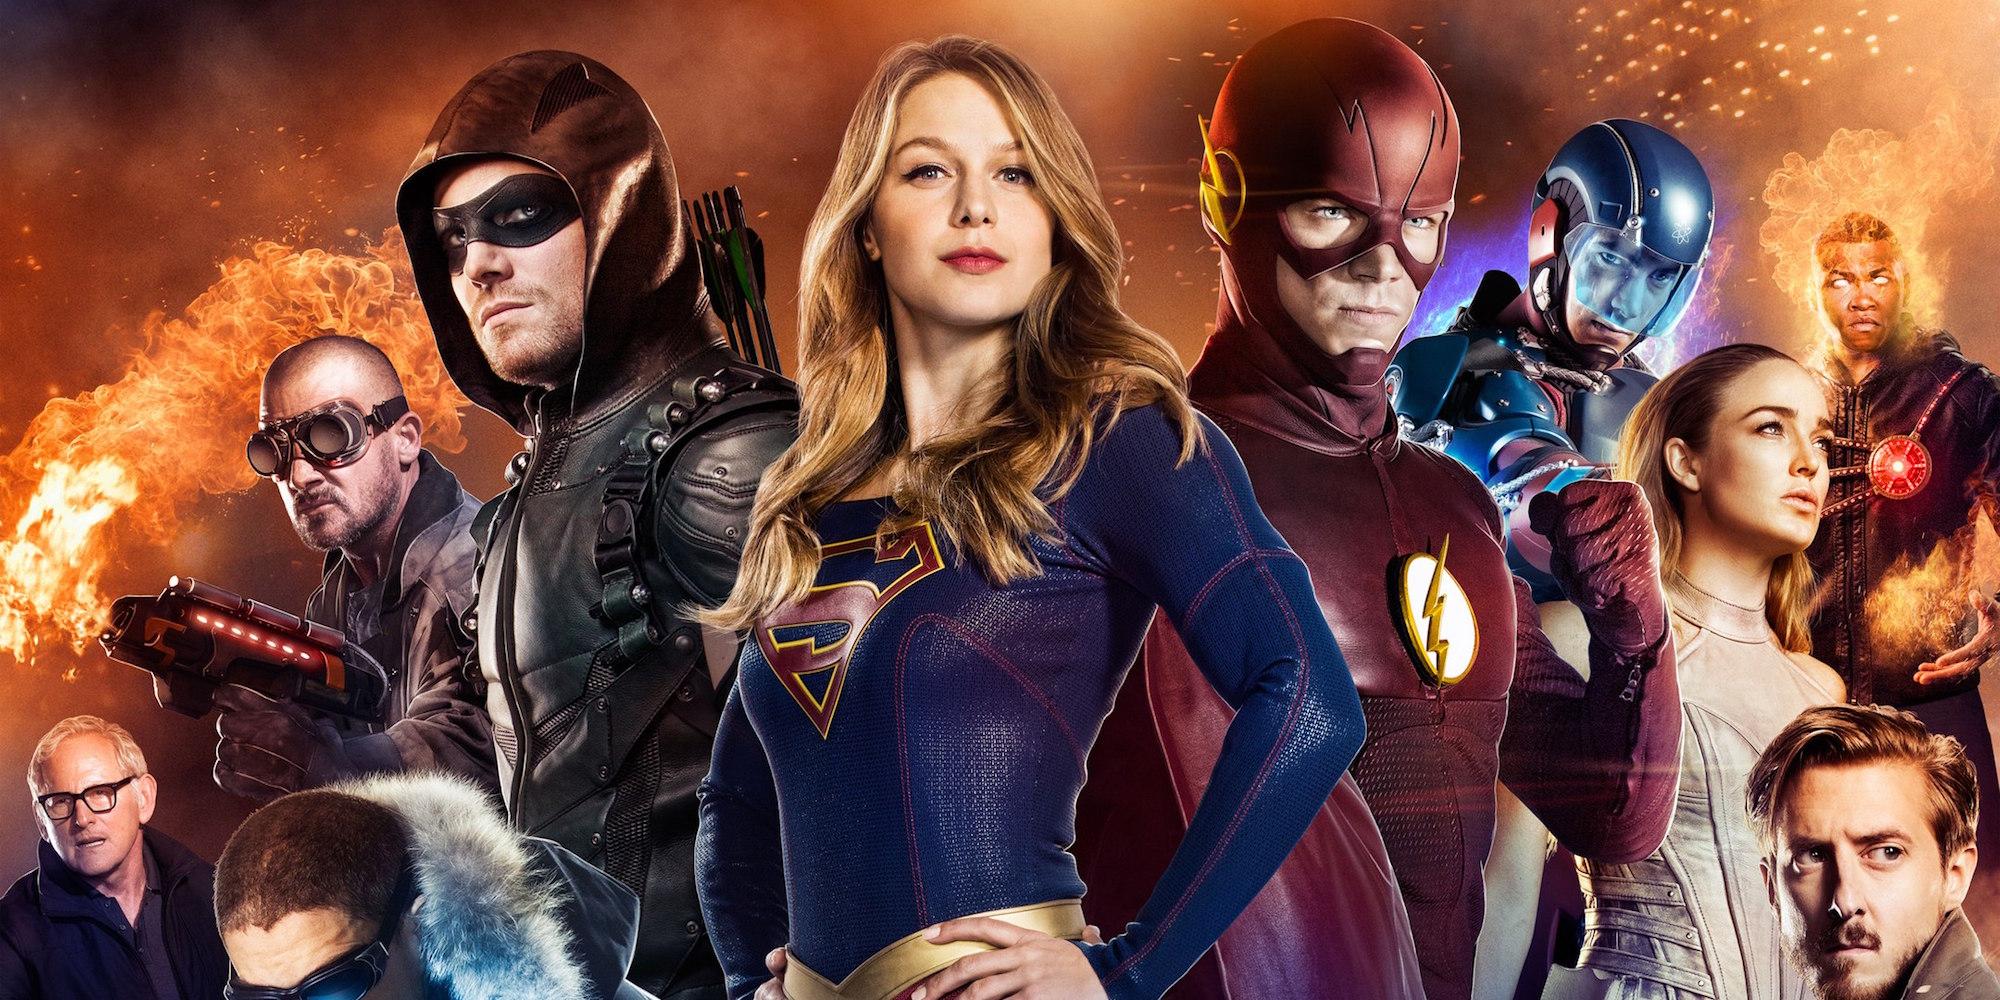 dc superhero wallpaper  CW DC Superhero Crossover, HD Tv Shows, 4k Wallpapers, Images ...